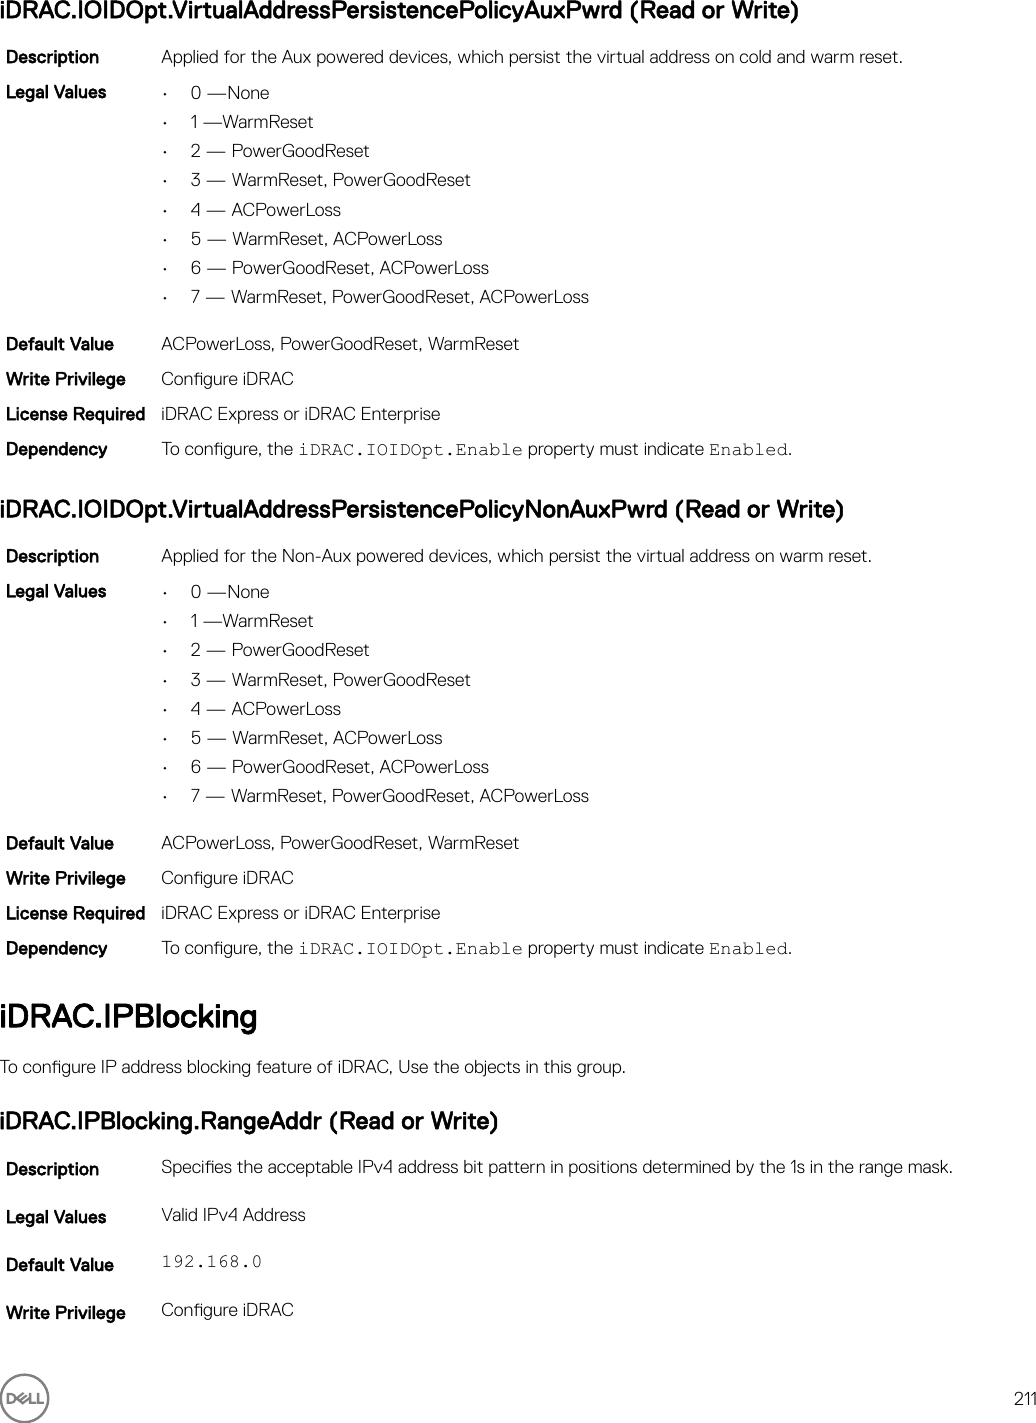 Dell Poweredge c4130 IDRAC 8/7 V2 30 30 30 RACADM CLI Guide User